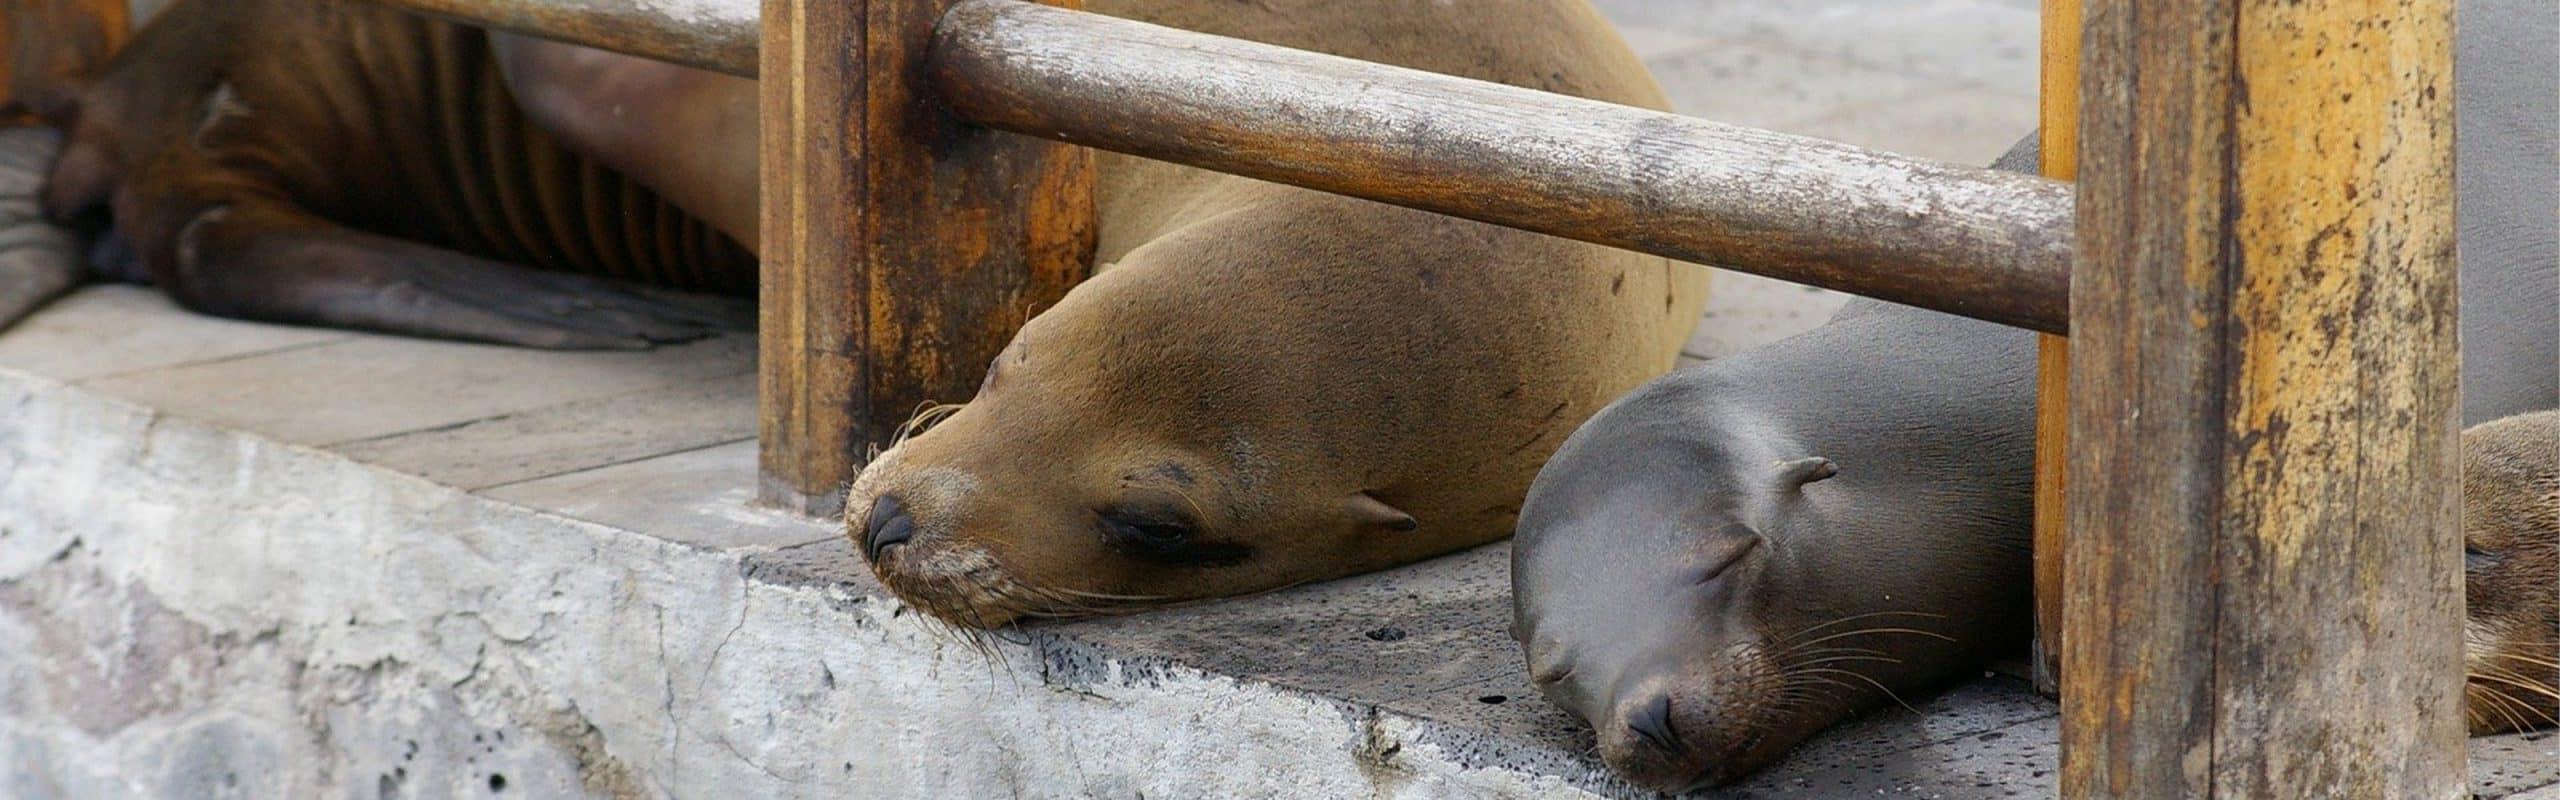 Galapagos Free Activities Hero 3200.1000